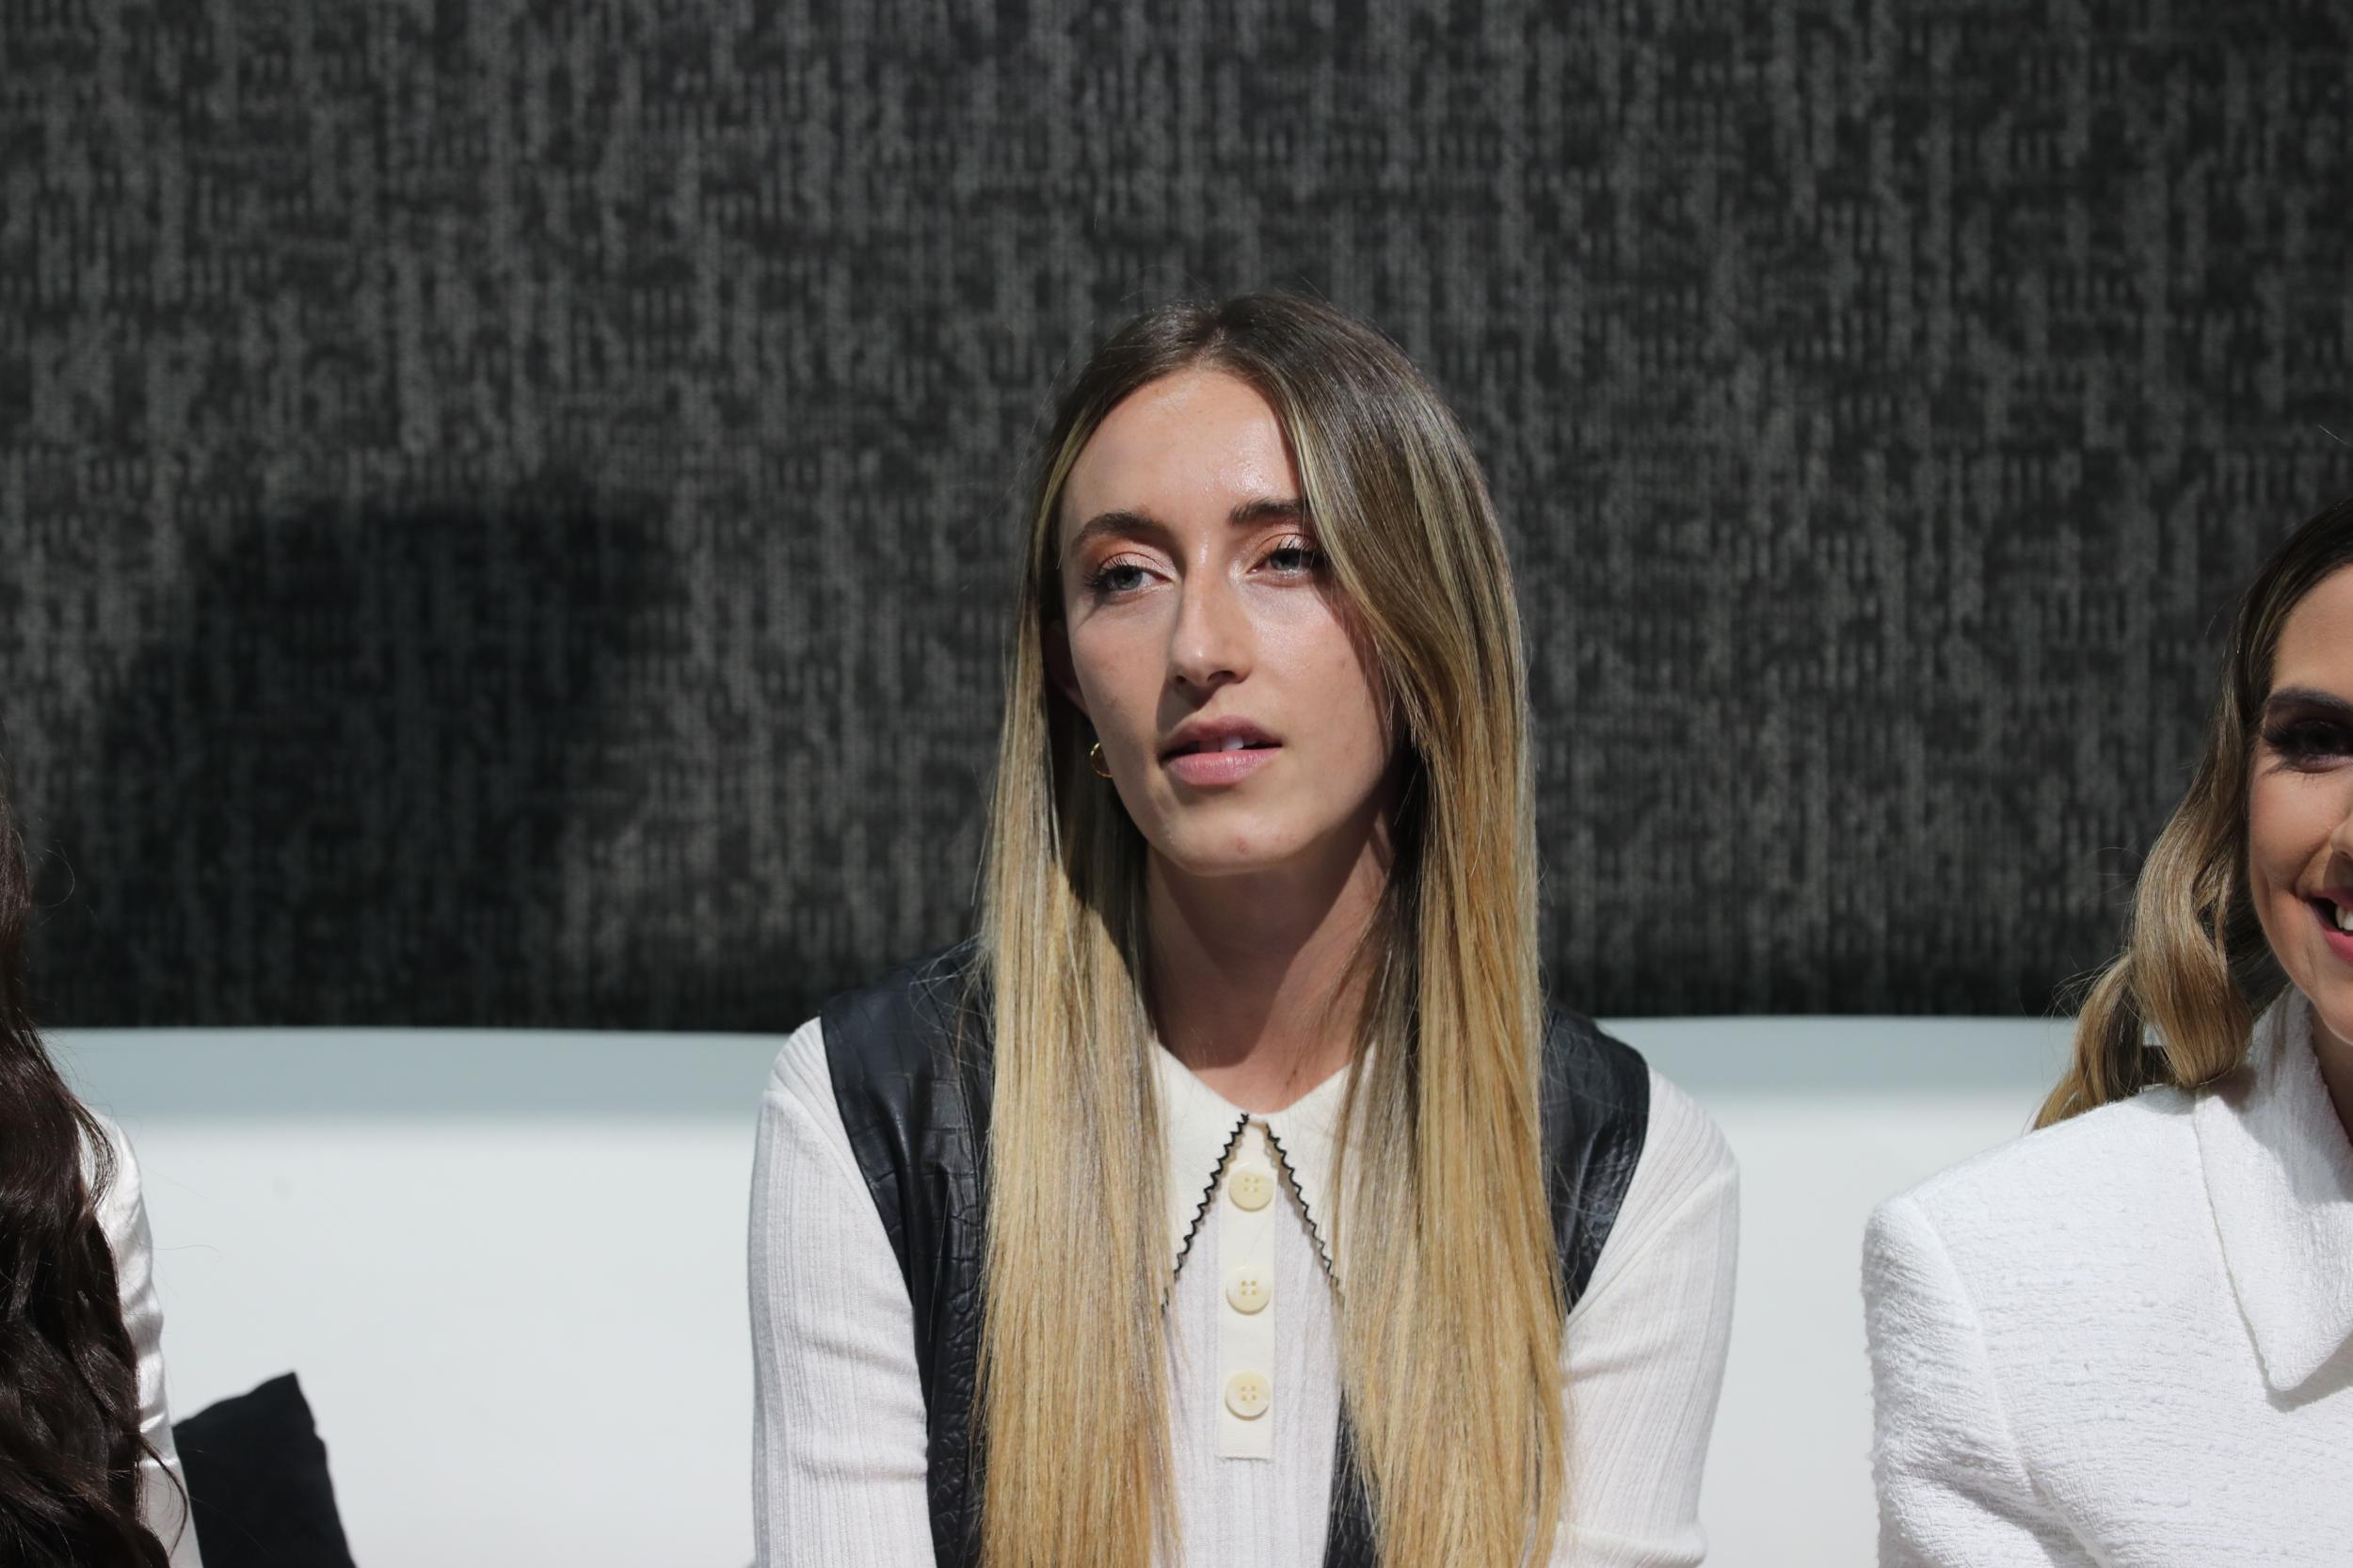 Alessandra Bregni, ganadora de The Fashion Games